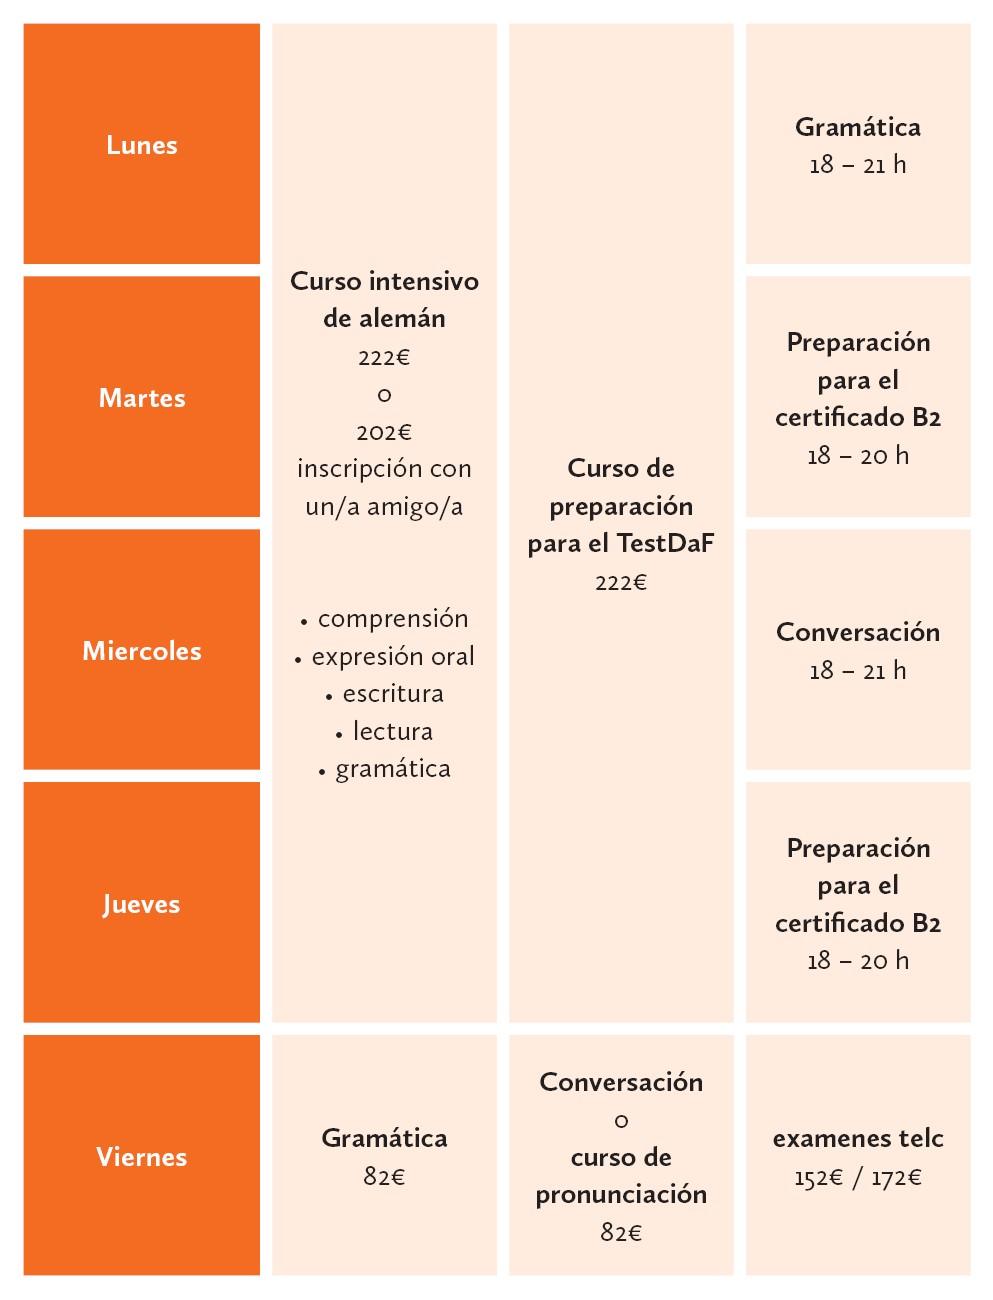 k2_grafik-preis_3